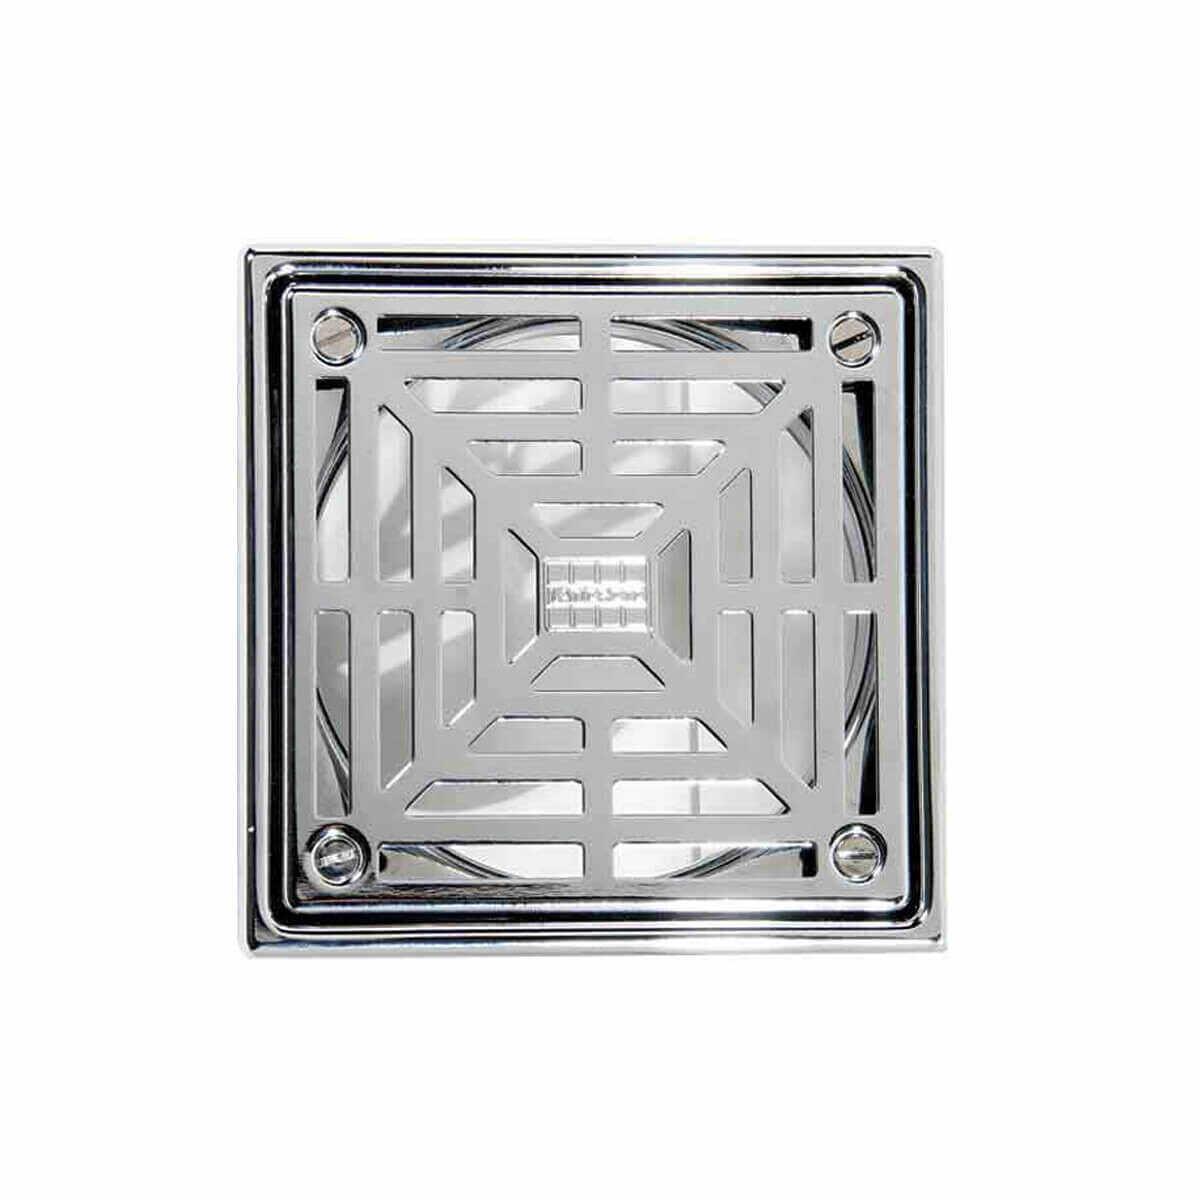 Laticrete 5 inch Square Polished SS Shower Drain